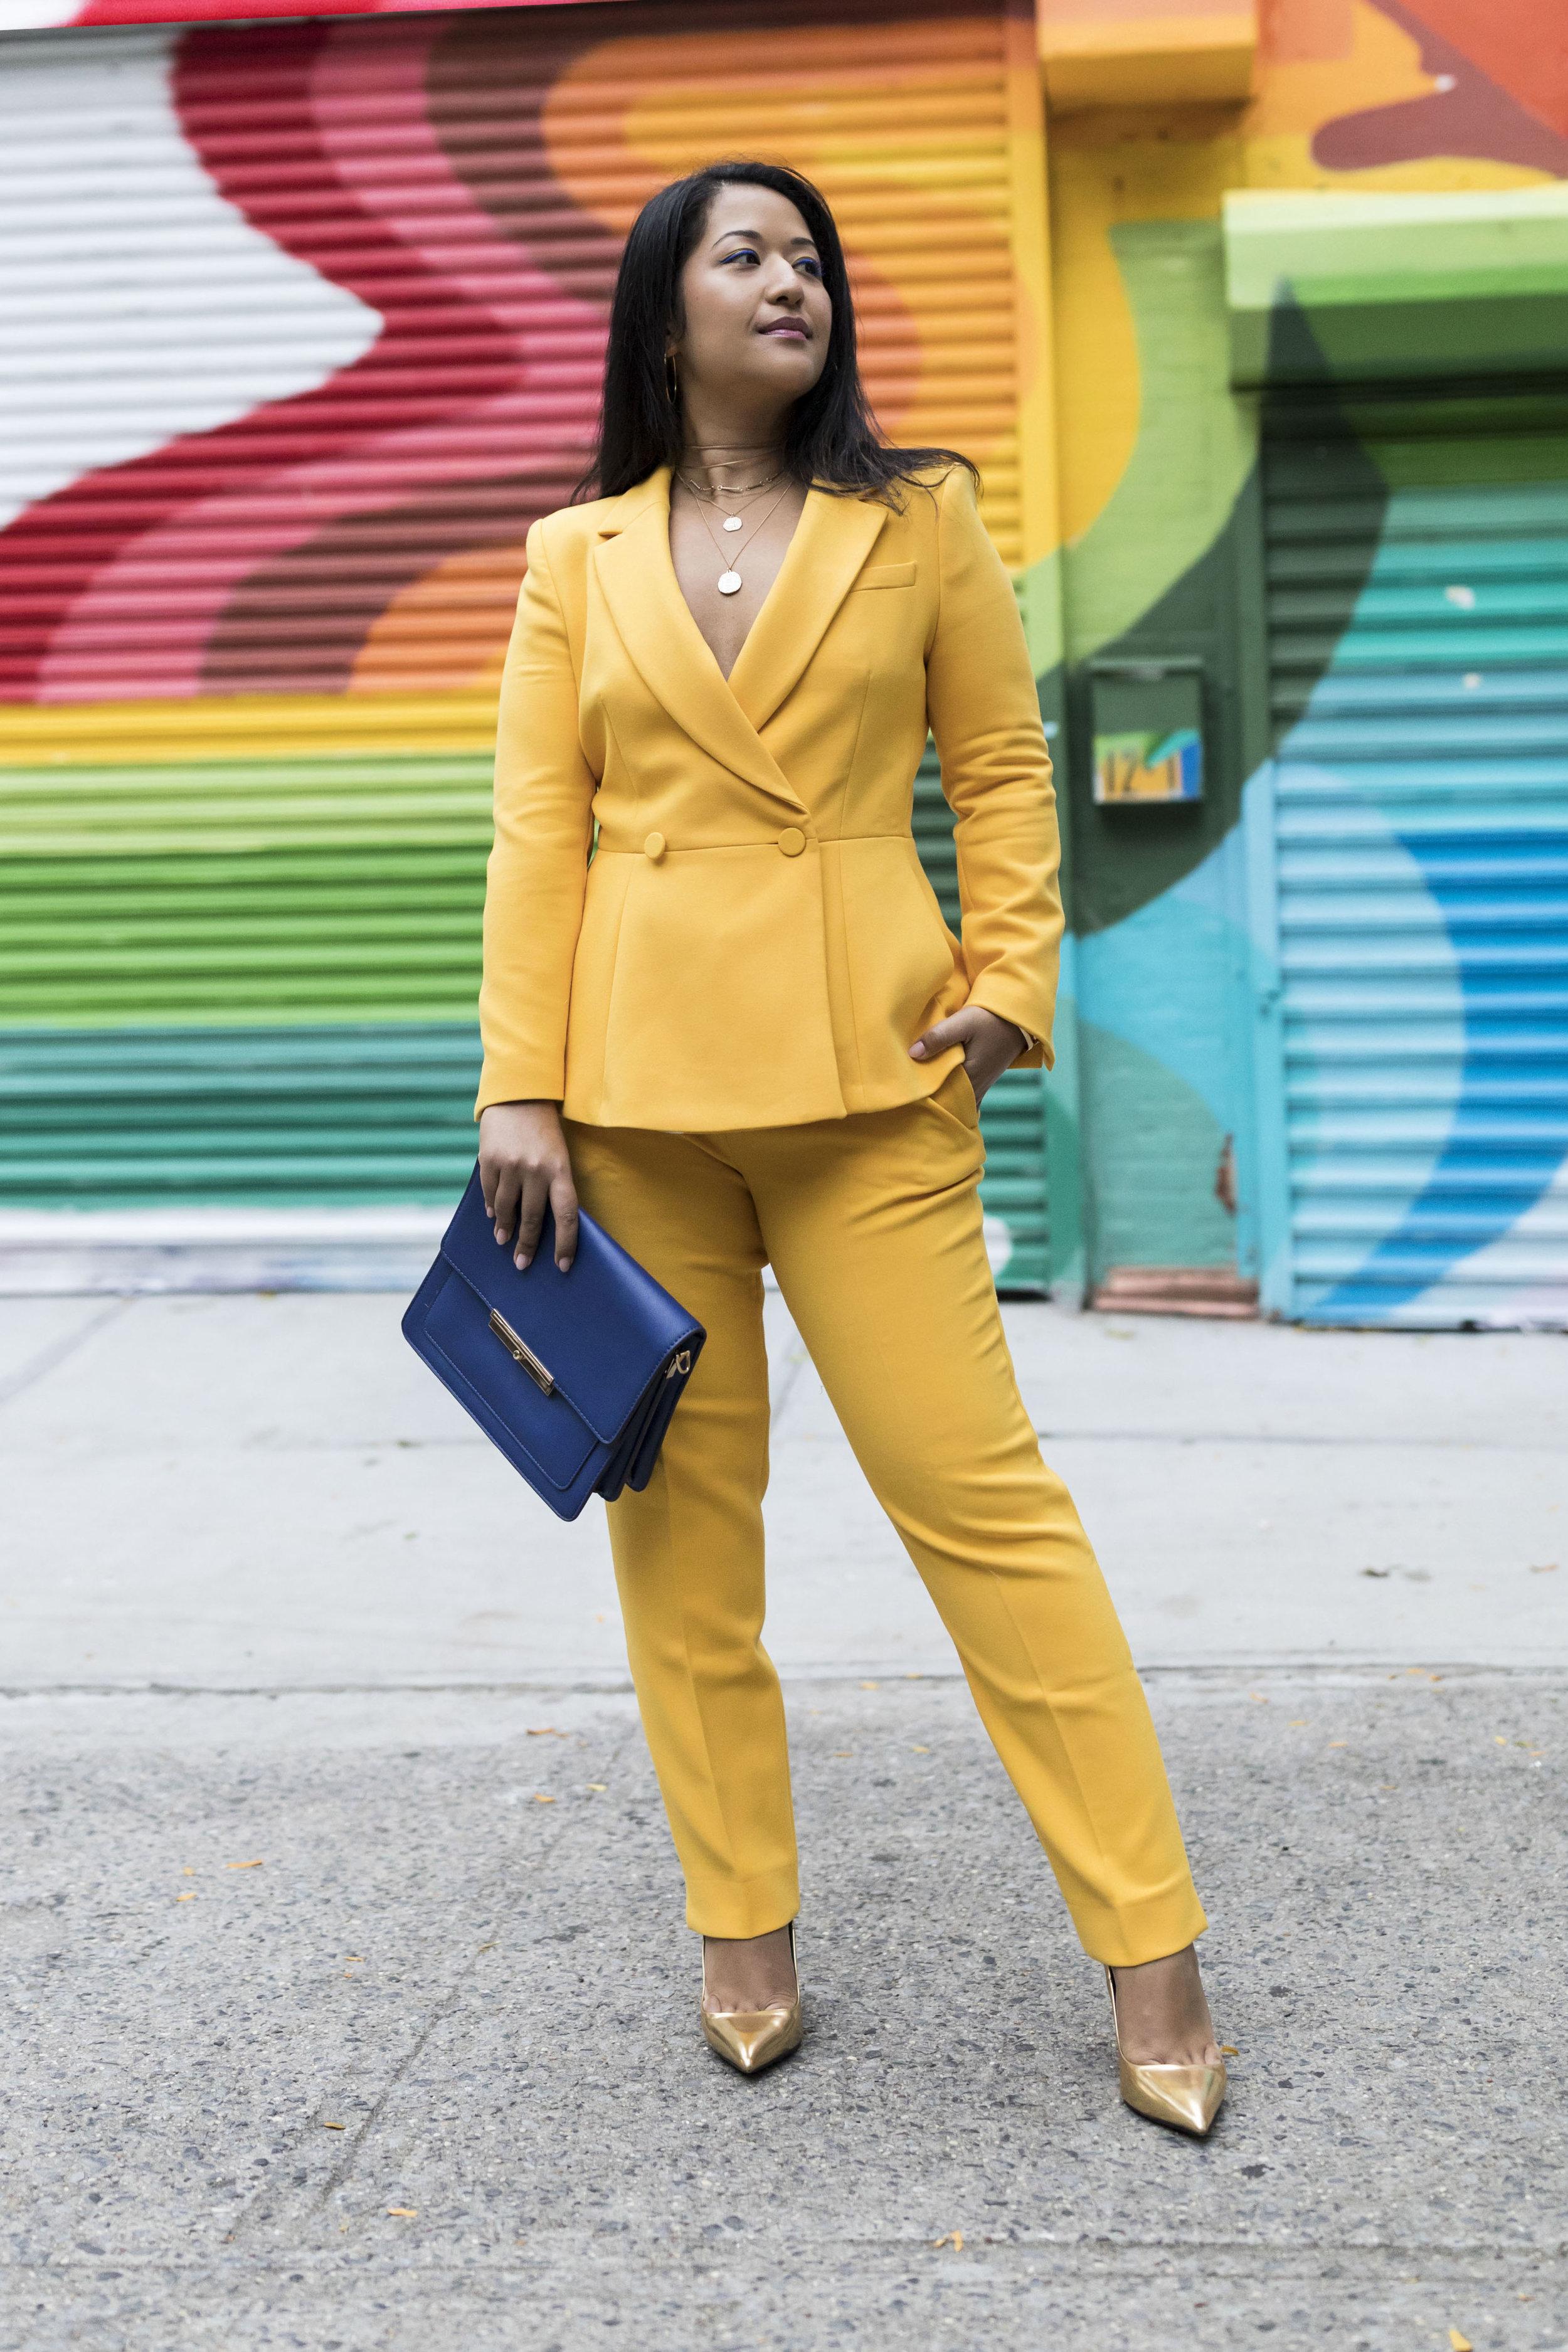 Krity S x Yellow Suit6.jpg